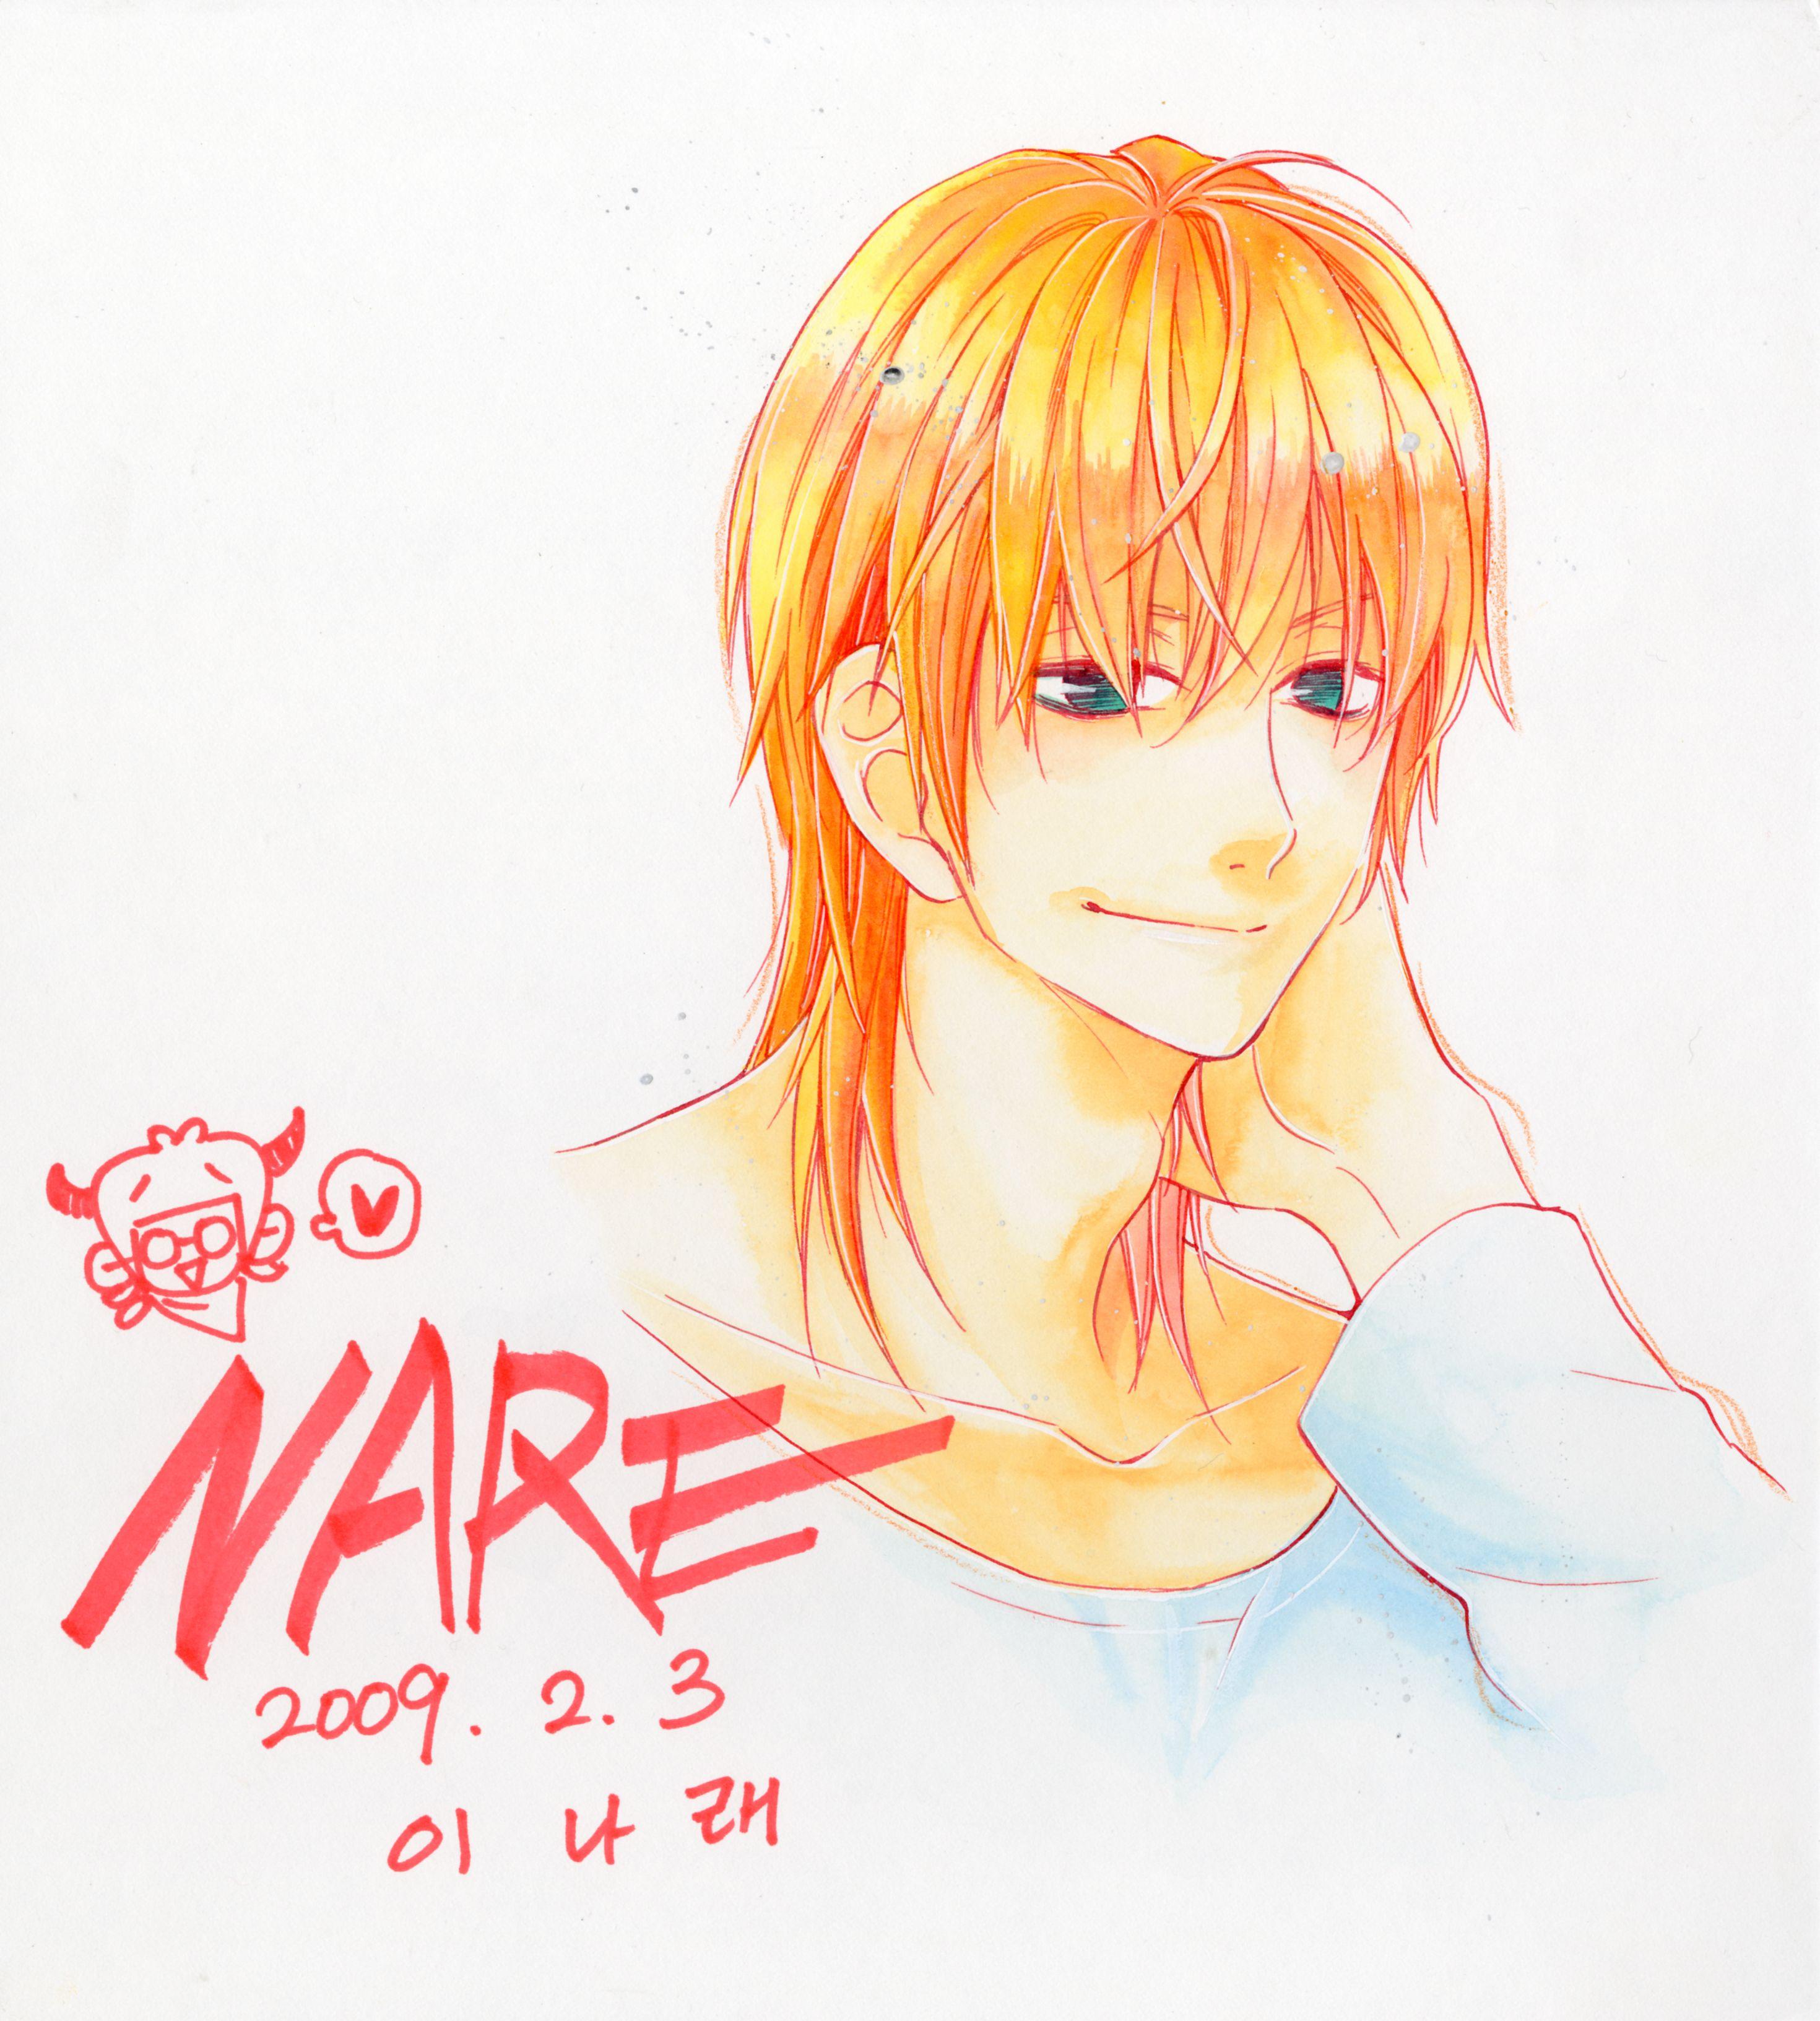 Character design for Iggy, of the Maximum Ride manga ...